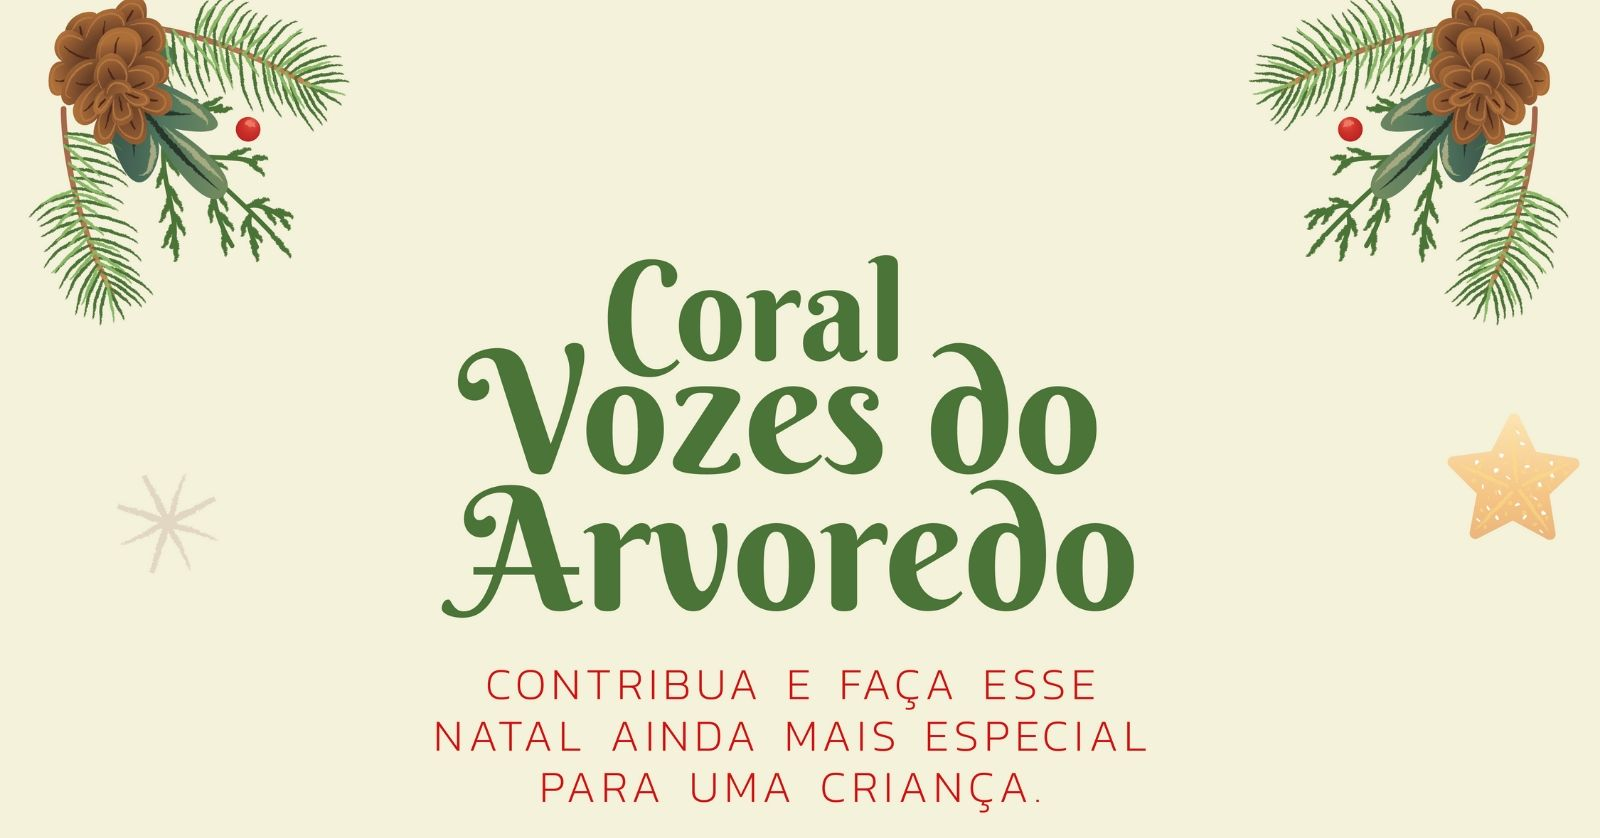 Coral Vozes do Arvoredo